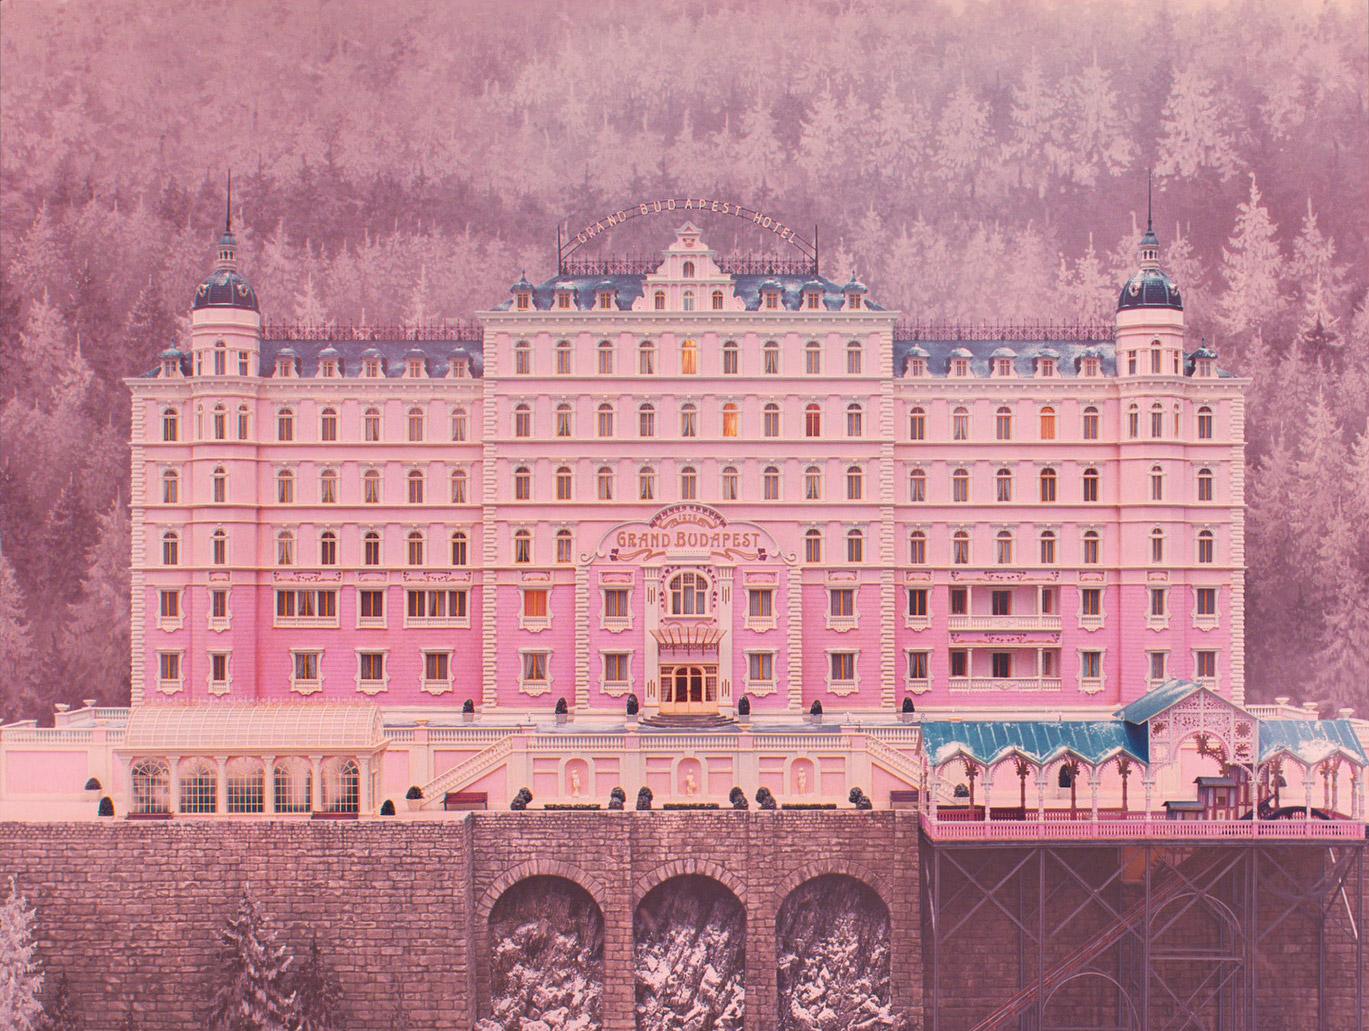 The Grand Budapest Hotel 010